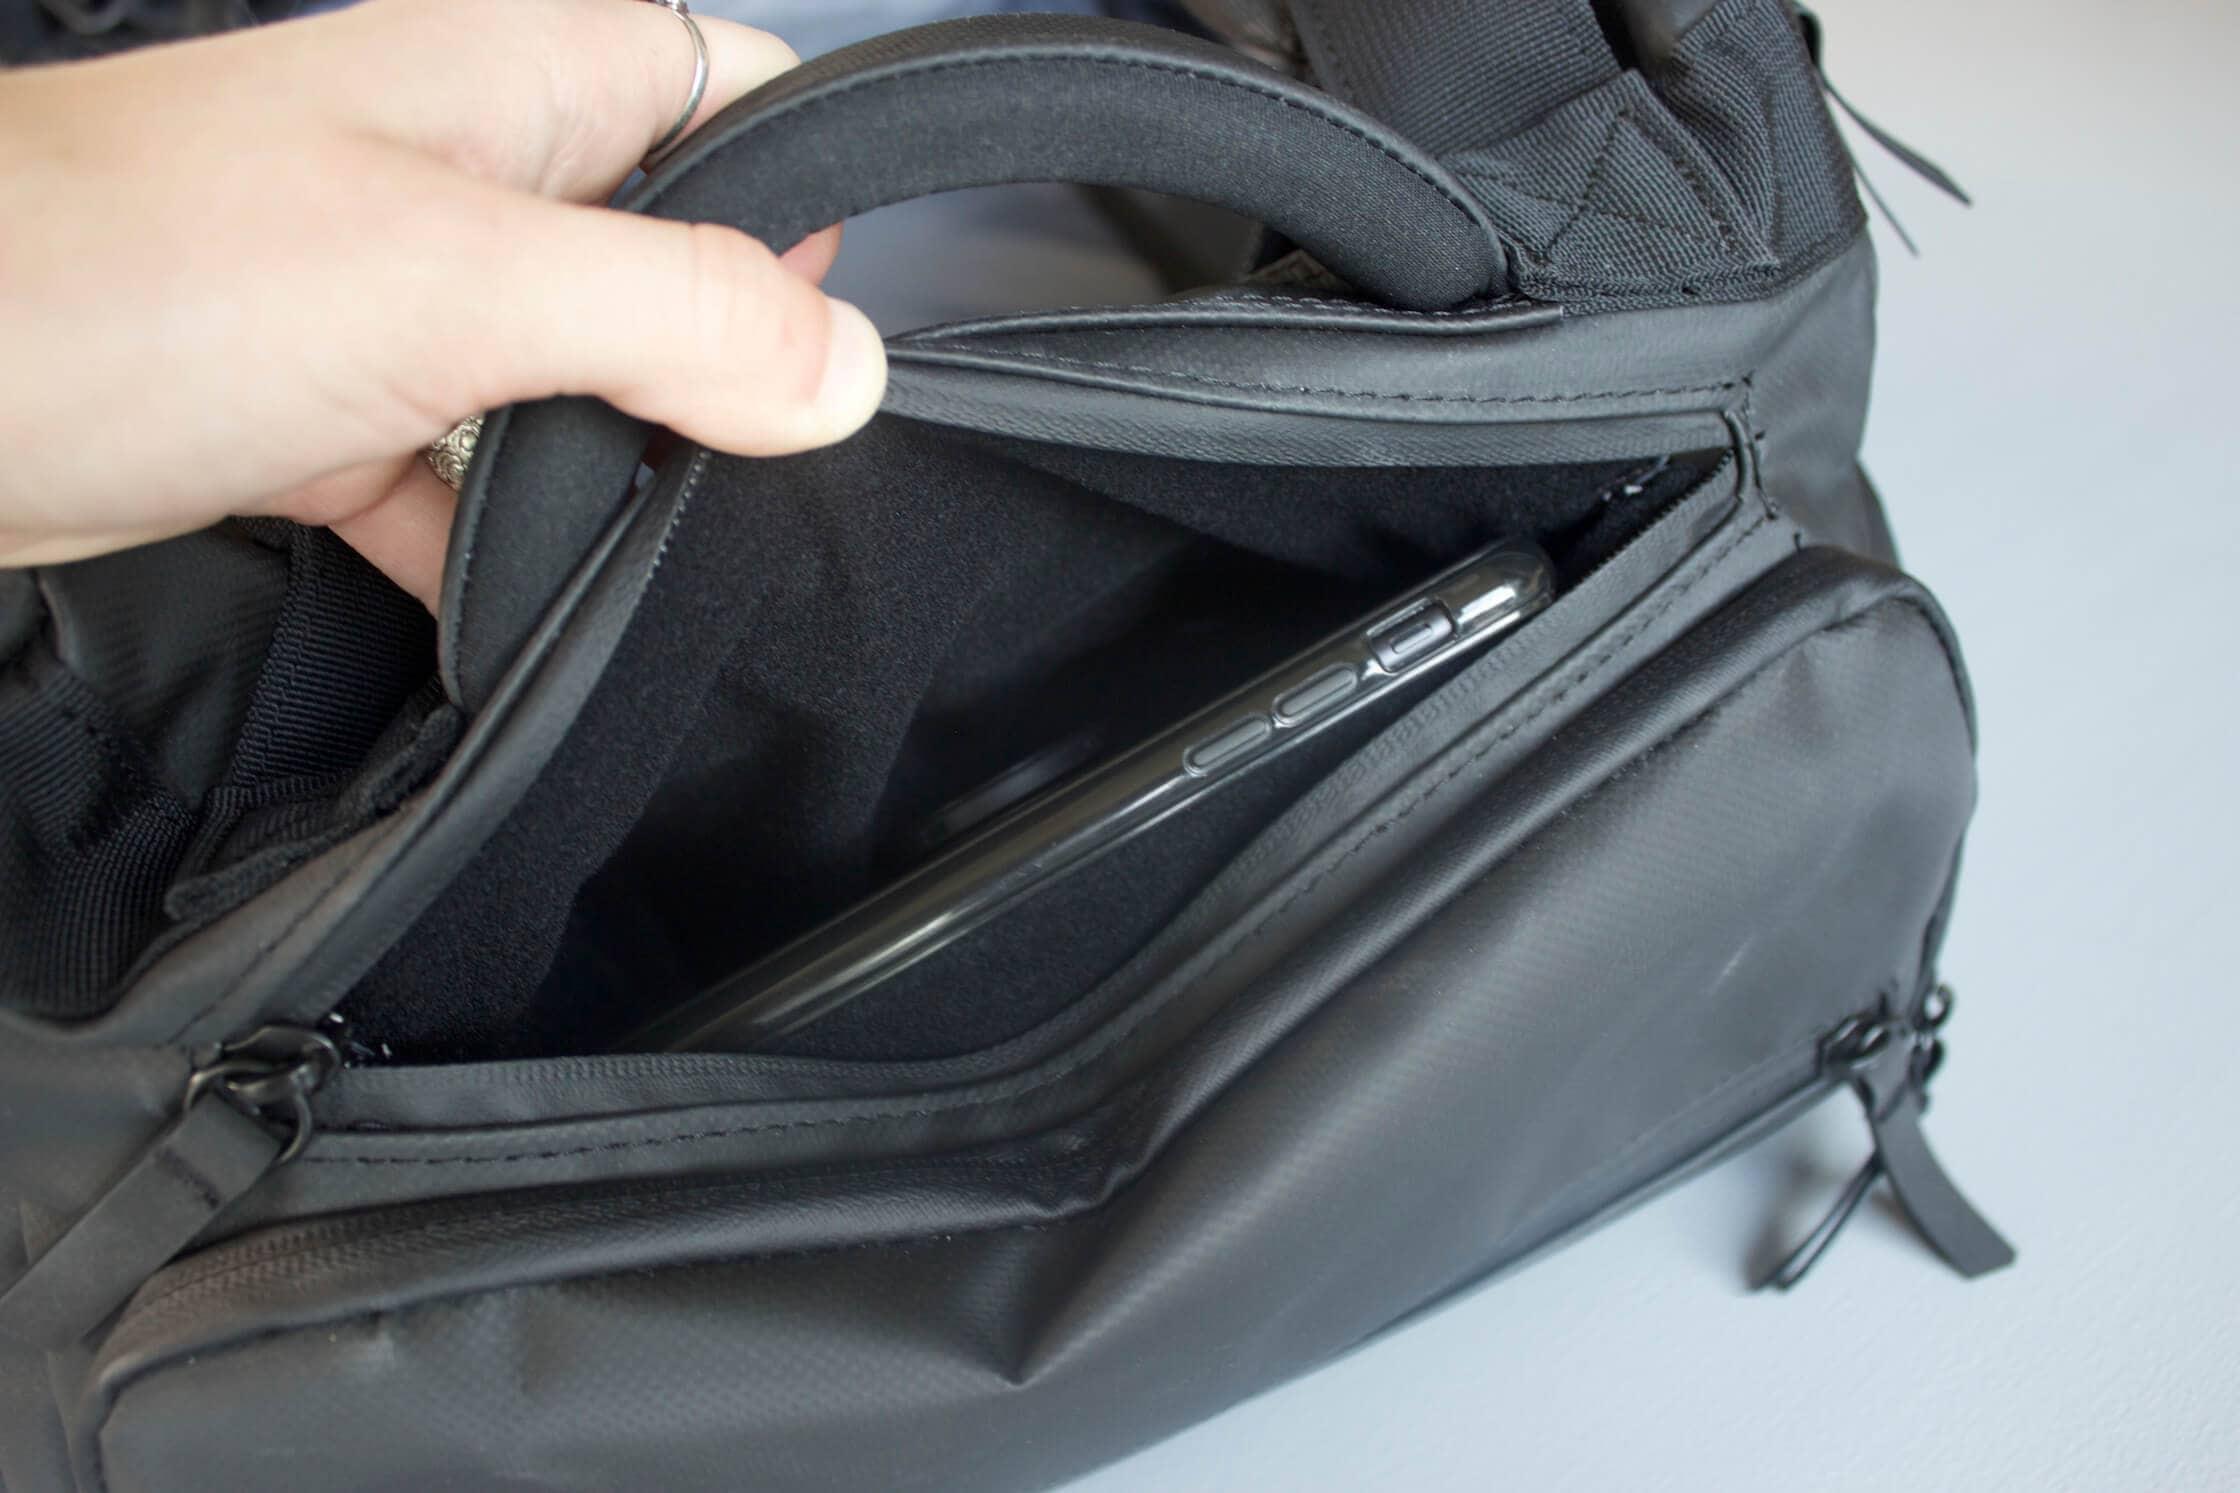 NOMATIC Travel Bag Felt-Lined Easy Access Pocket